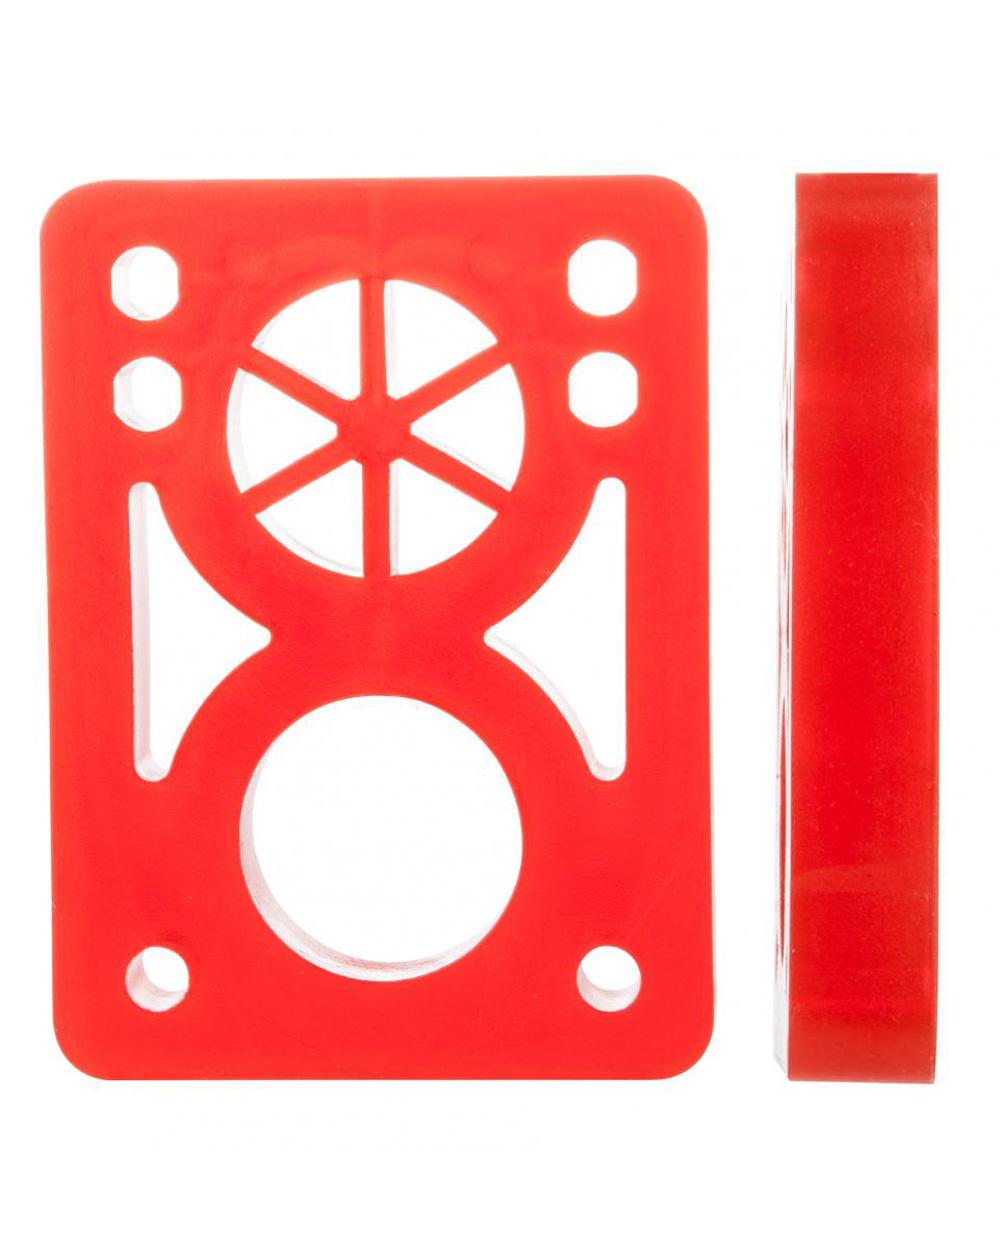 D-Street Soft 1/2-inch Skateboard Baseplates Clear Red 2 er Pack